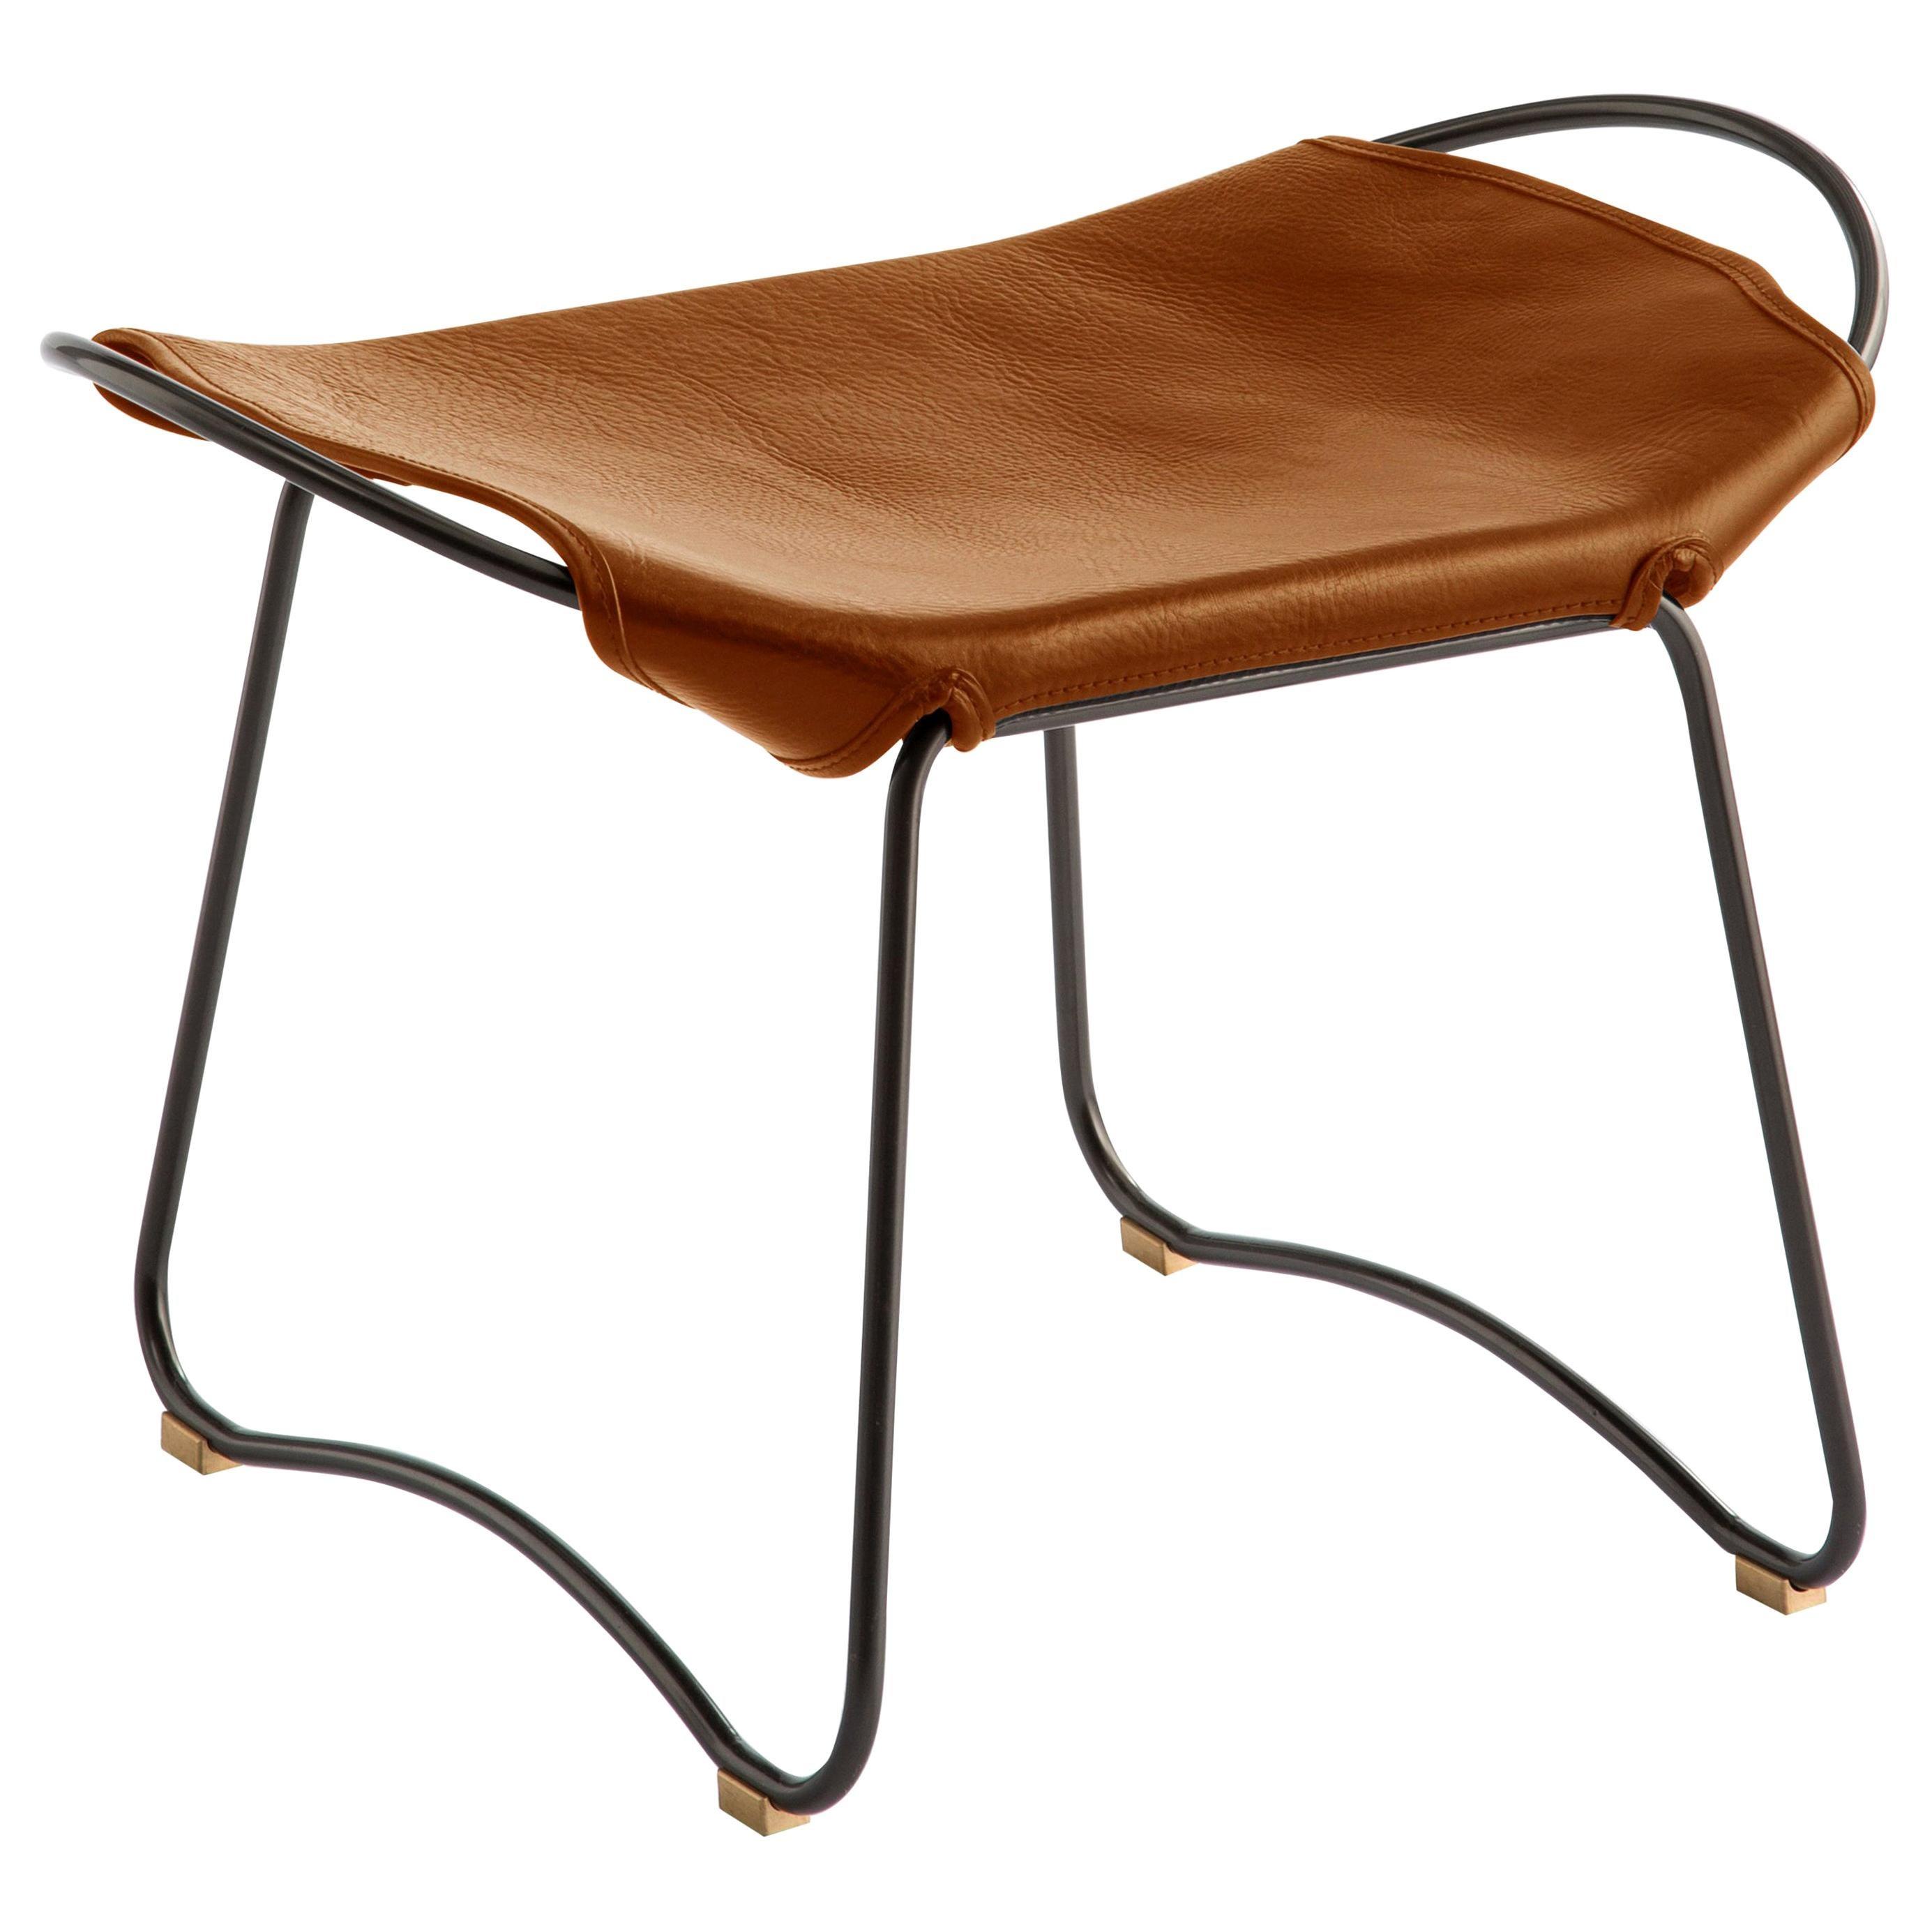 Footstool, Black Steel and Vegetable Tobacco Leather, Modern Style, Hug